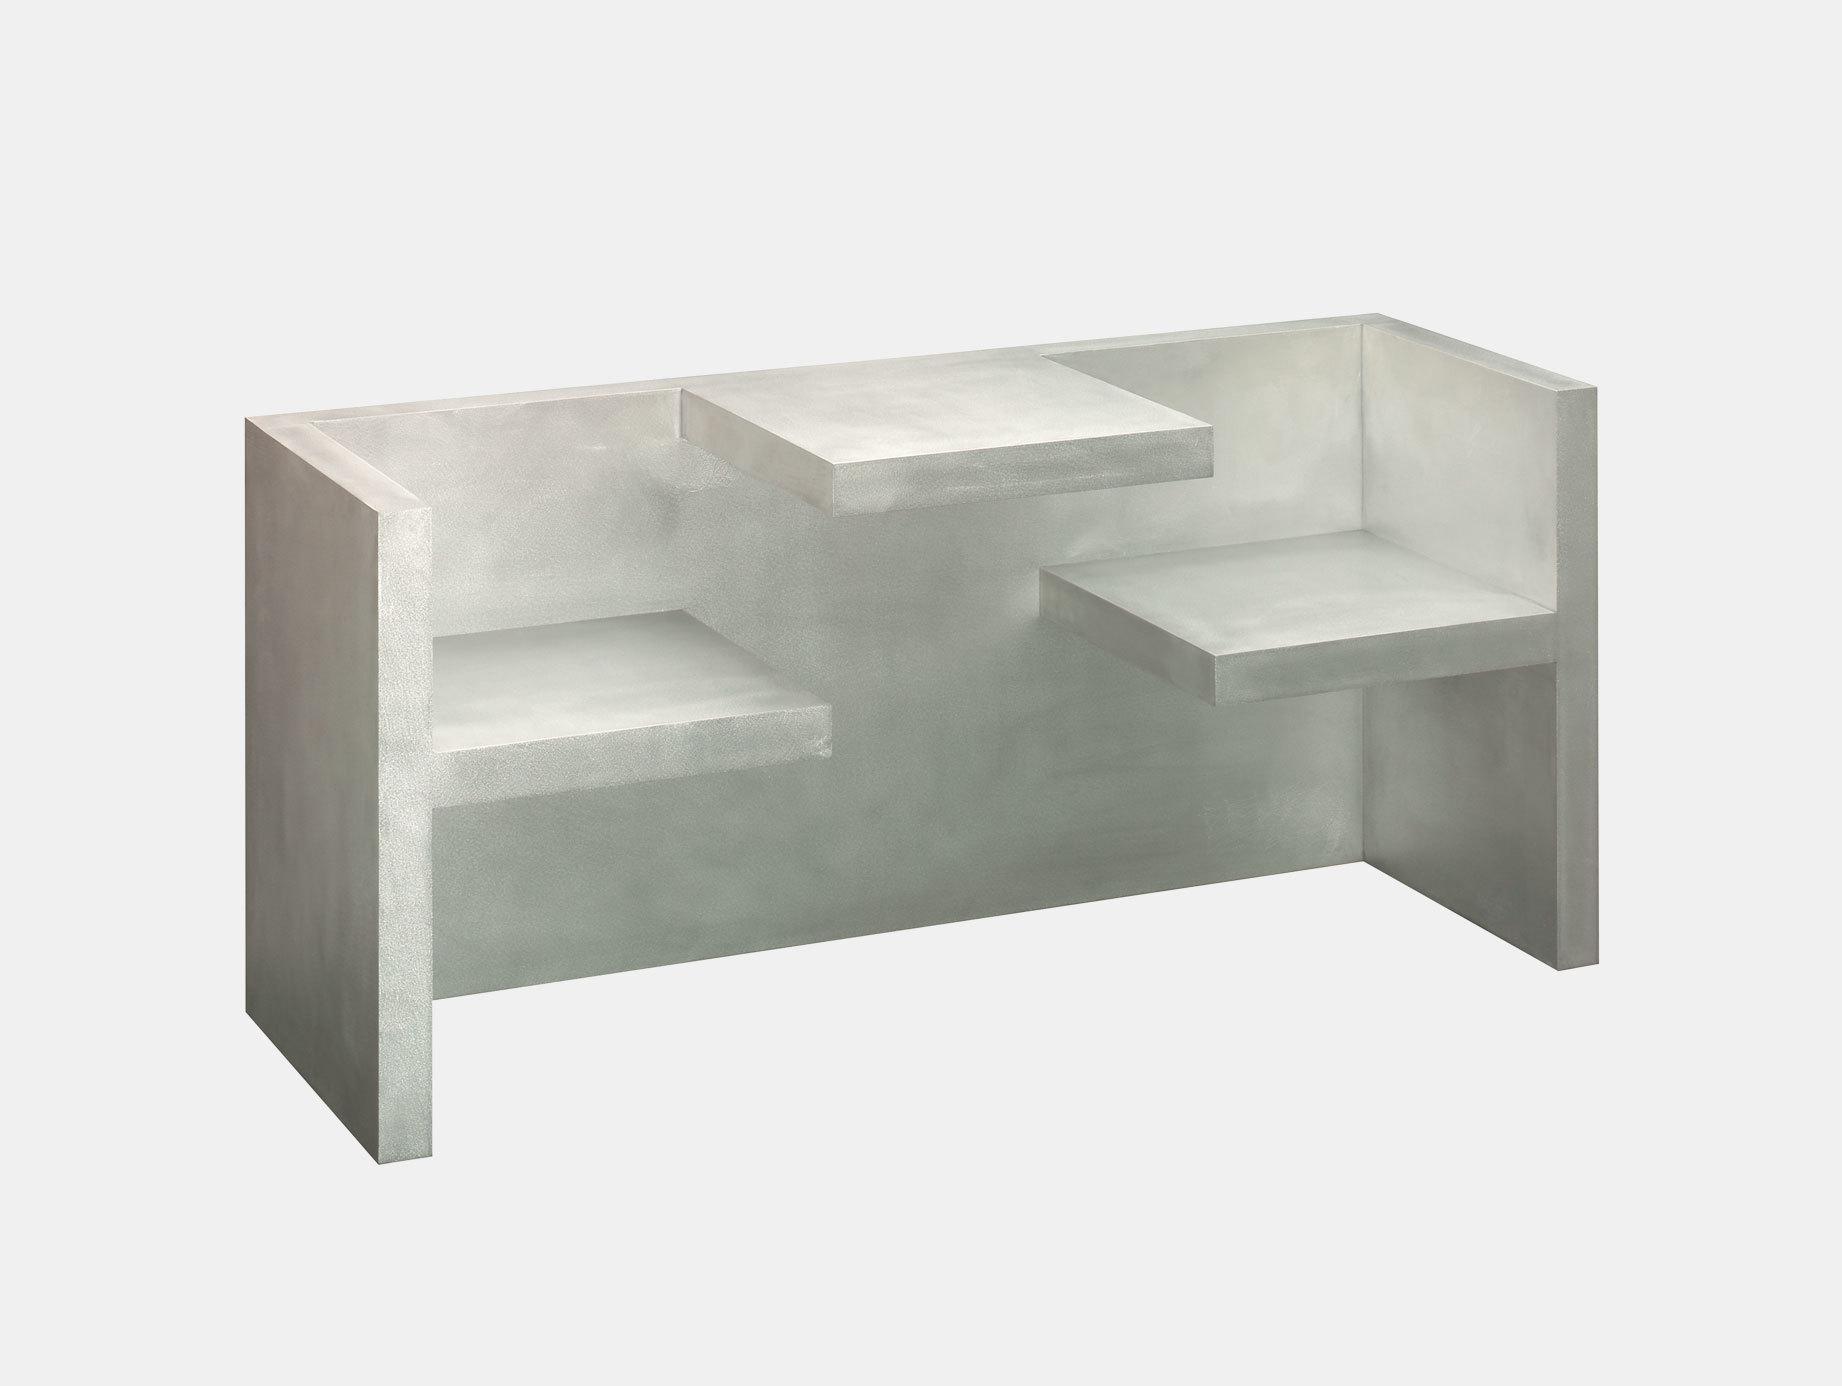 Tafel table bench viaduct